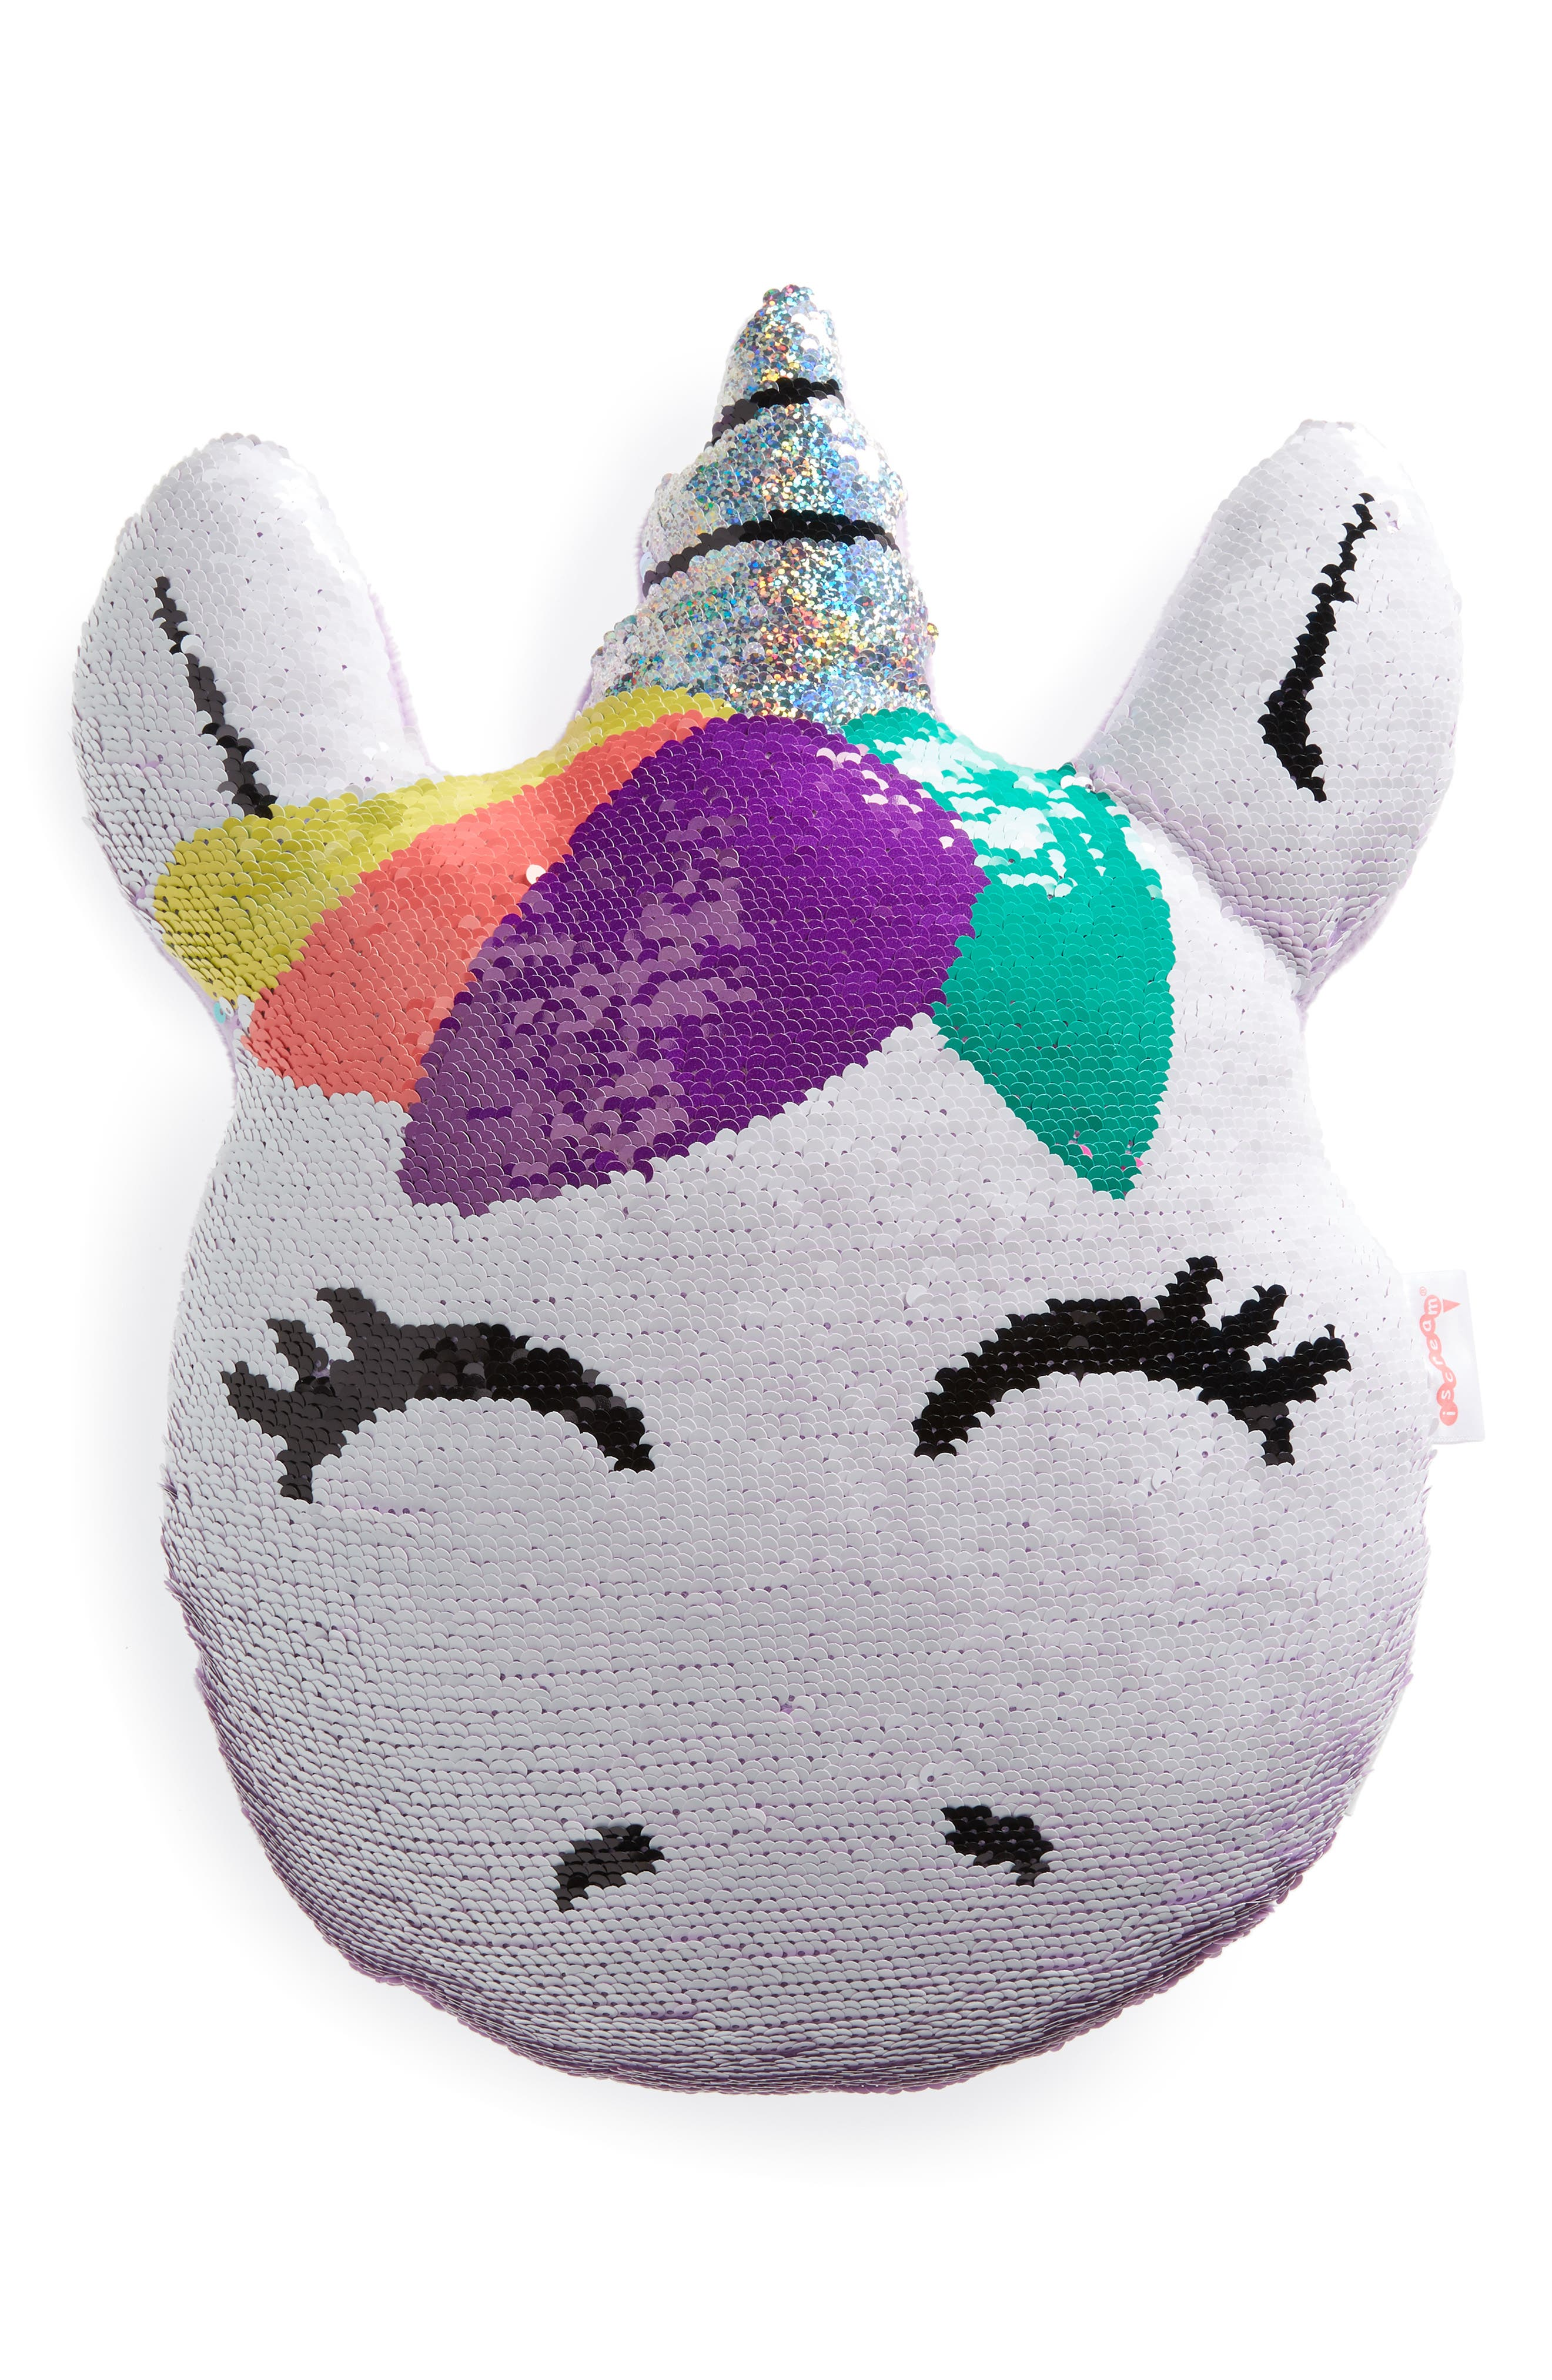 ISCREAM, Unicorn Reversible Sequin Pillow, Main thumbnail 1, color, 650